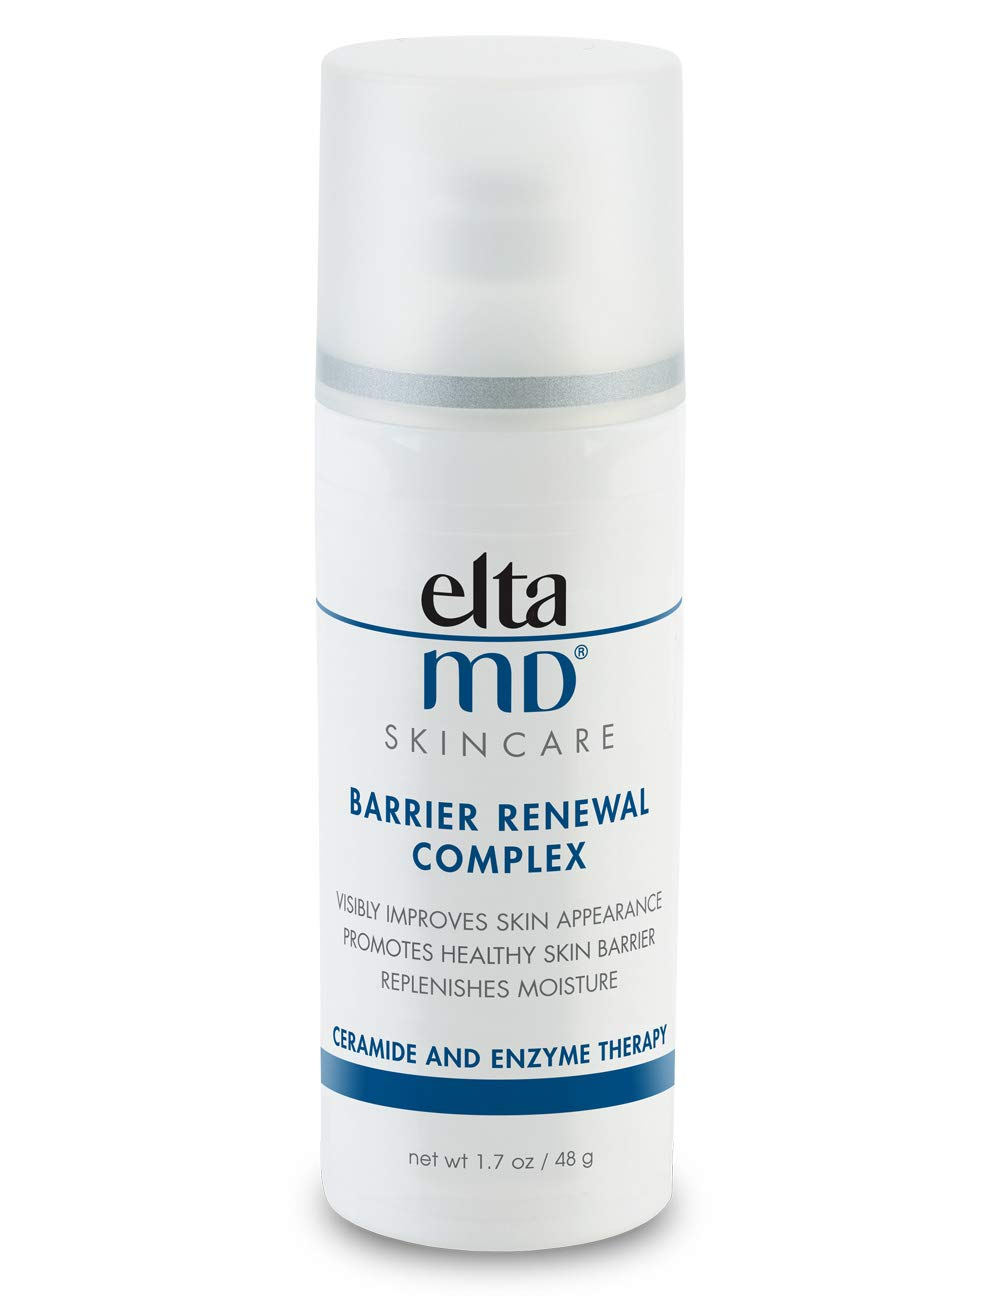 EltaMD Barrier Renewal Complex Facial Moisturizer for Dry Skin, Dermatologist-Recommended, 1.7 oz